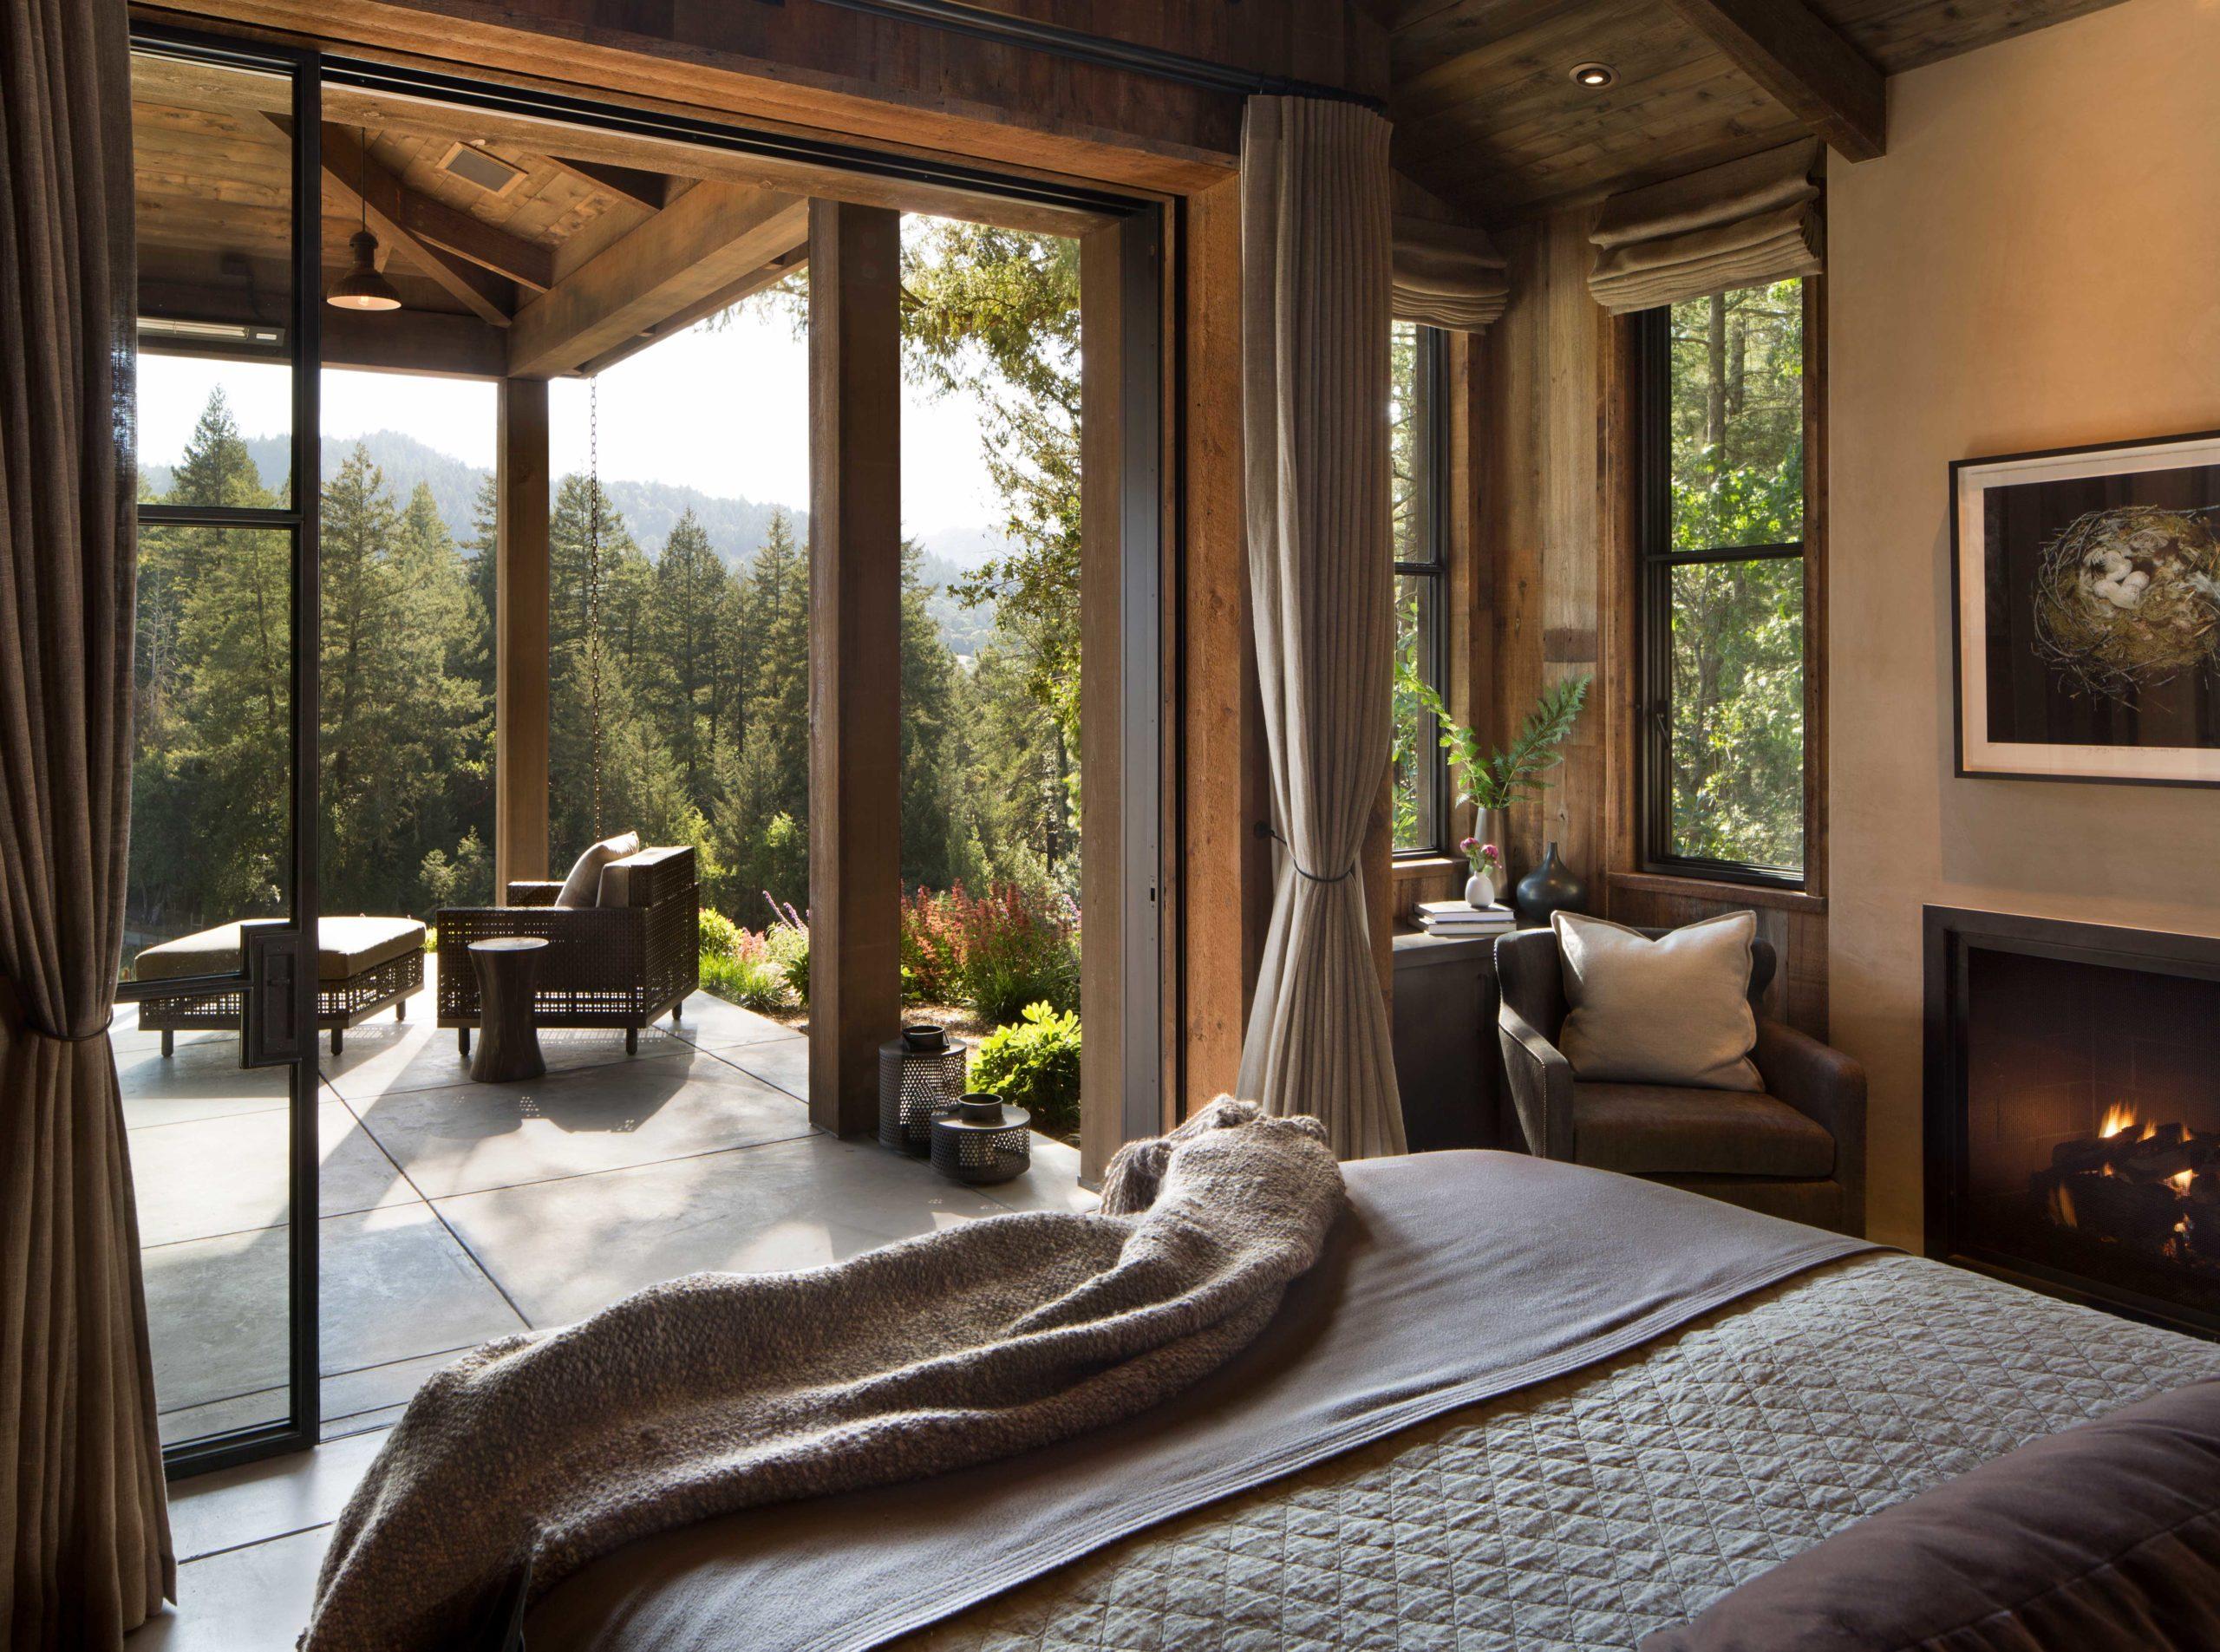 Jennifer_robins_interiors_projects_st_helena_II_Bergman_08_HR_bedroom_to_exterior_ext